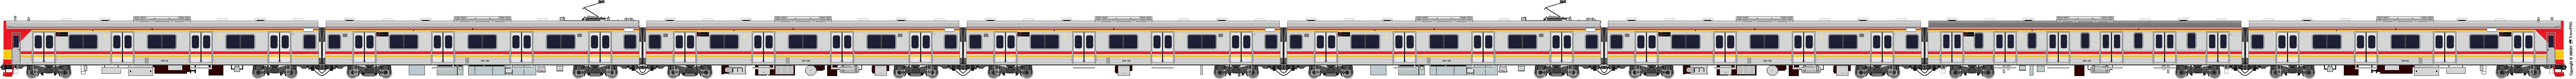 [5414] KAI Commuter Jabodetabek 5414